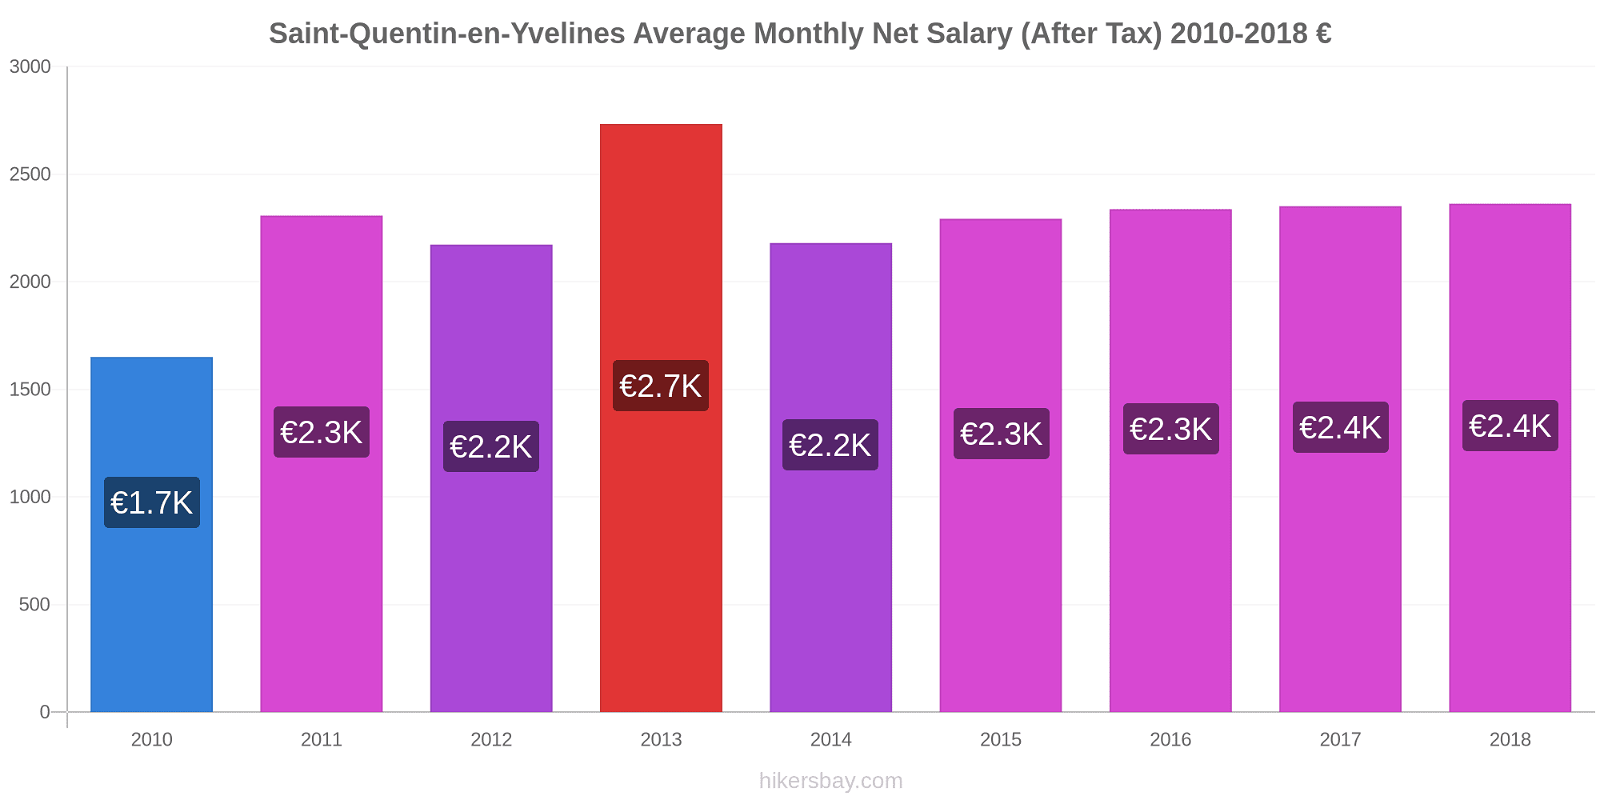 Saint-Quentin-en-Yvelines price changes Average Monthly Net Salary (After Tax) hikersbay.com